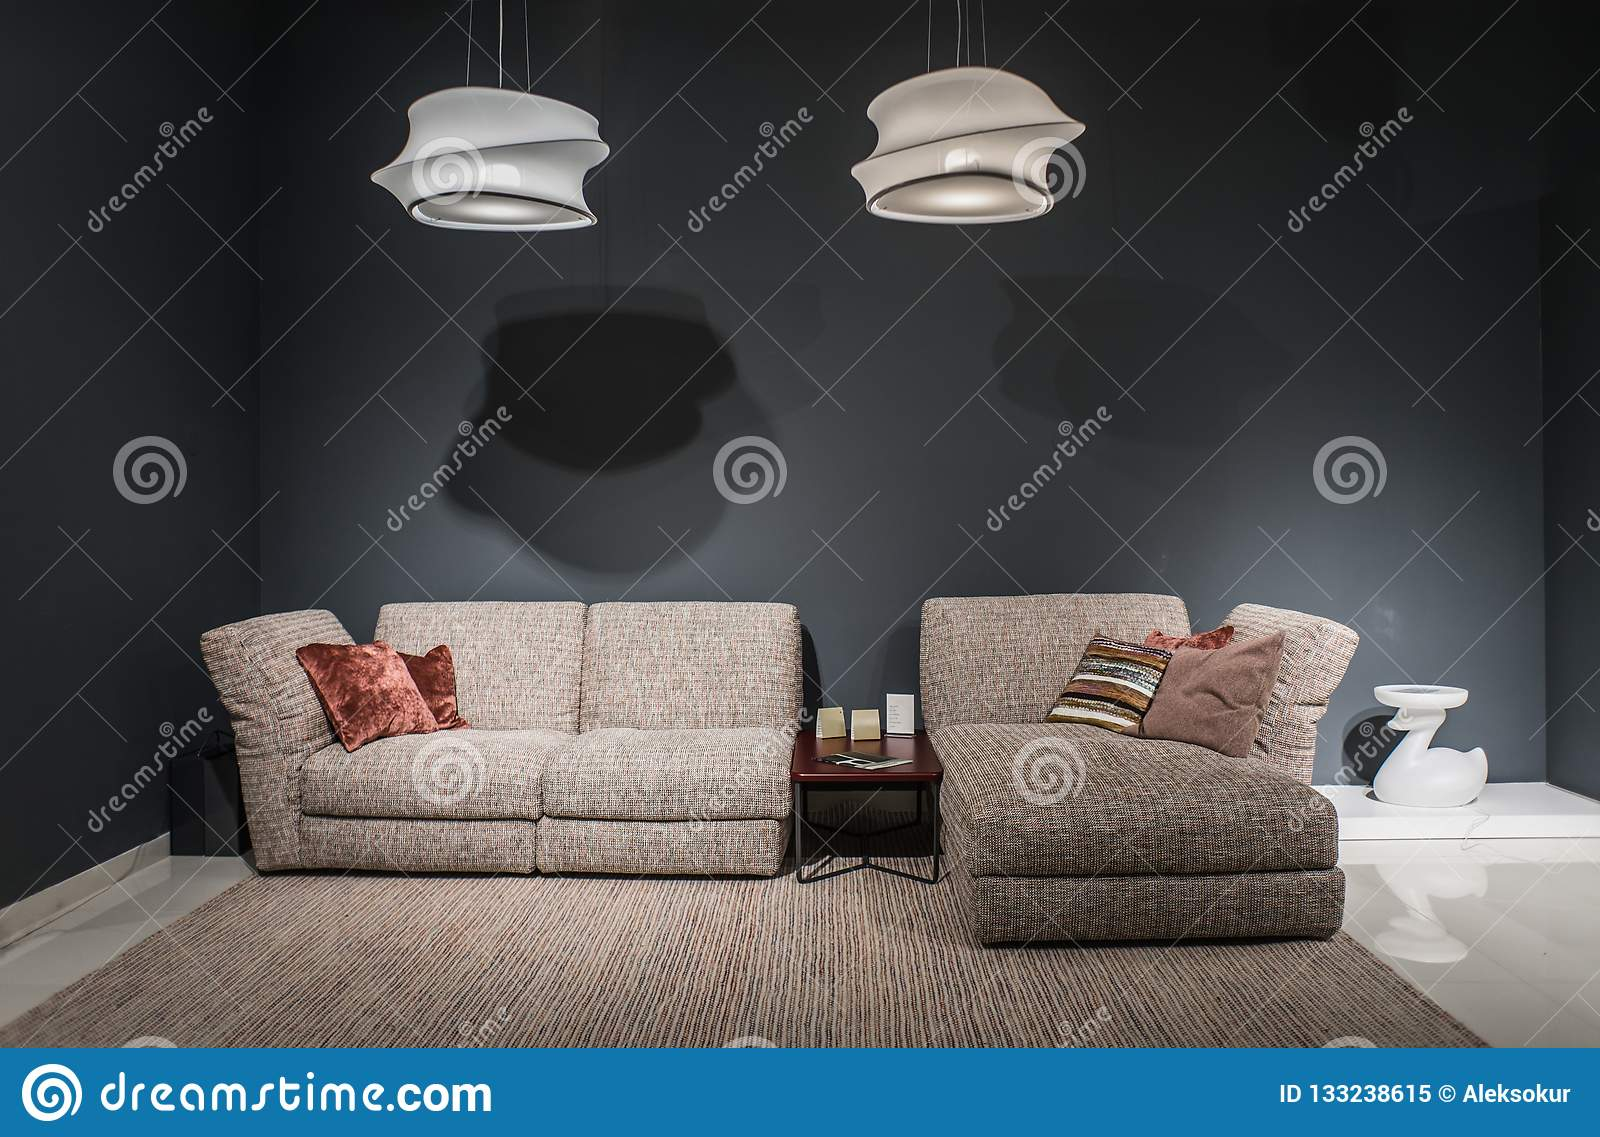 Темный интерьер комфорта просторной квартиры